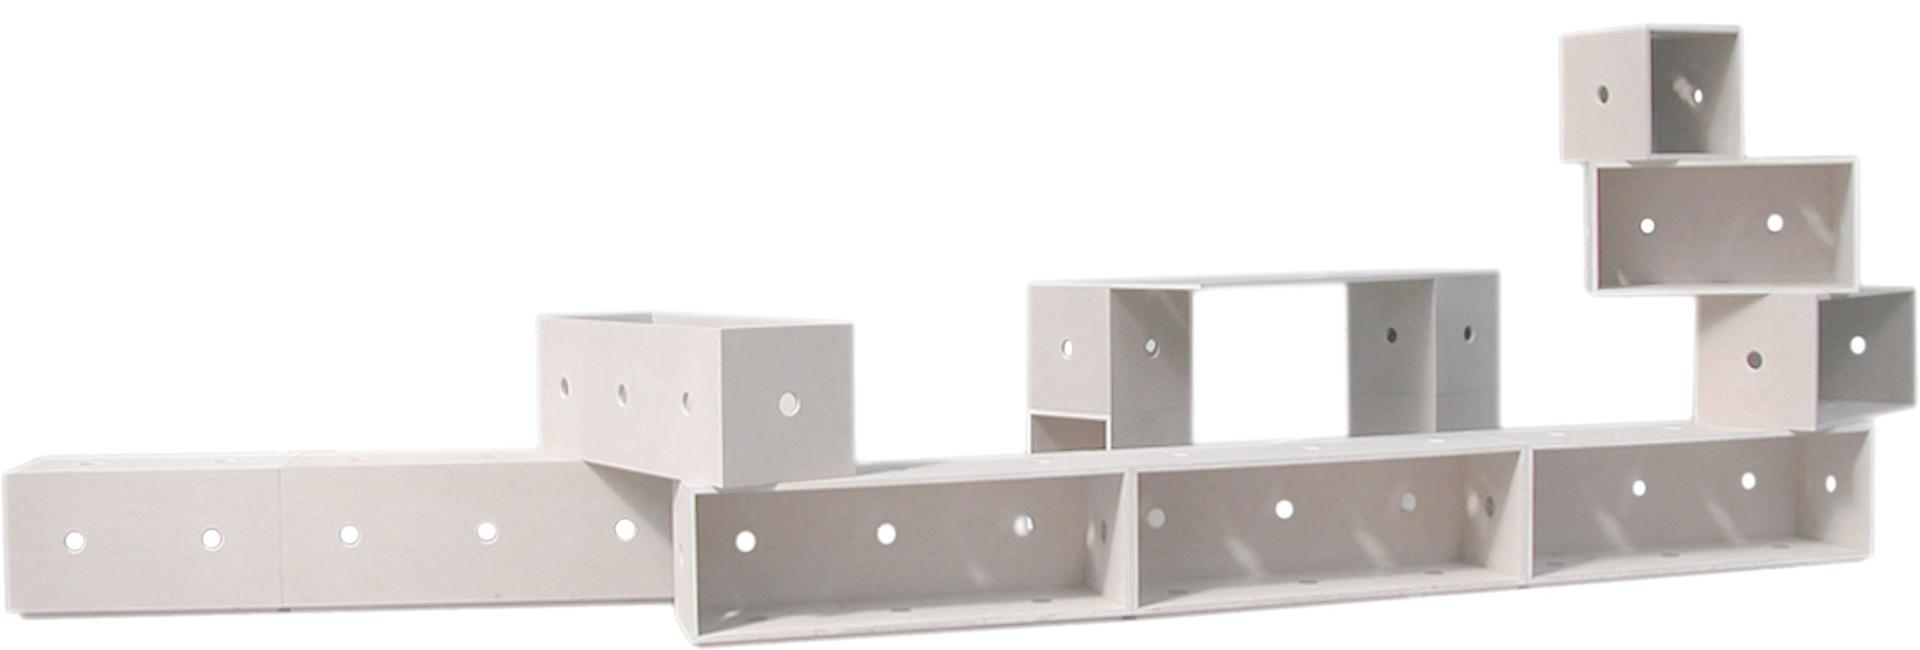 clipbox-flexibles-raum-moebel-system